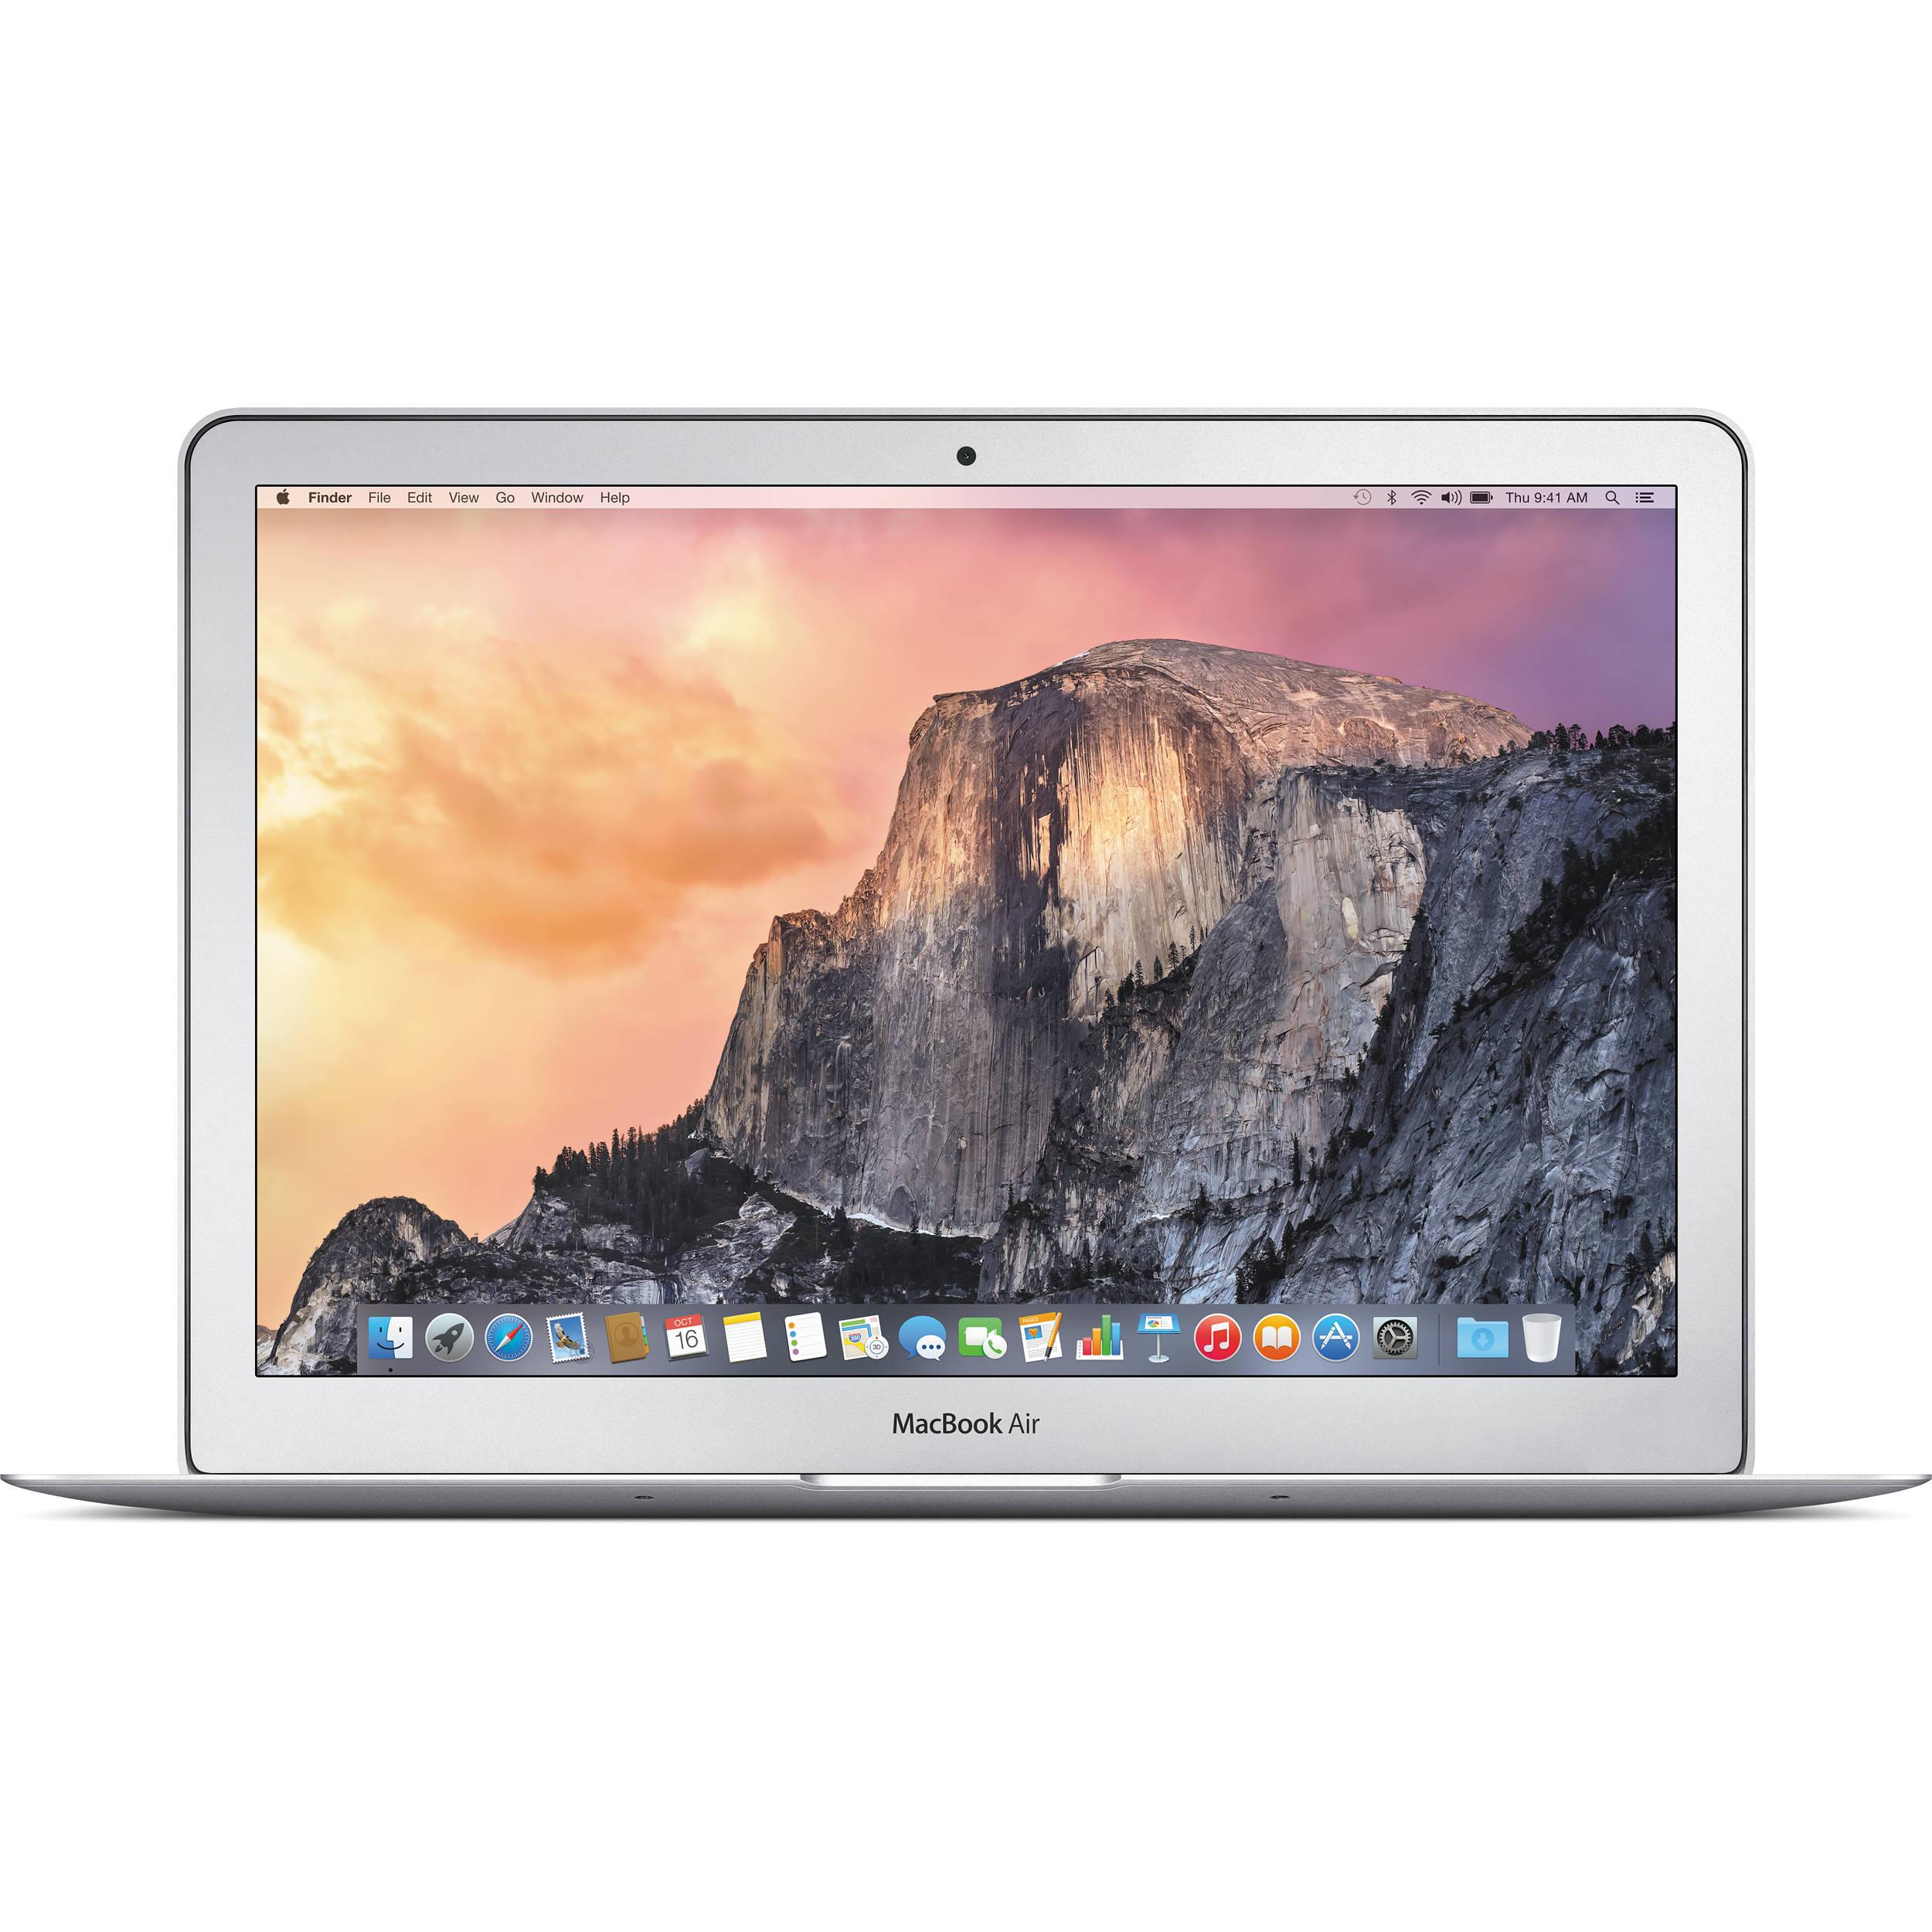 "Apple - MacBook Air® (Latest Model) - 13.3"" Display - Intel Core i5 - 8GB Memory - 128GB Flash Storage - Silver $799.99"